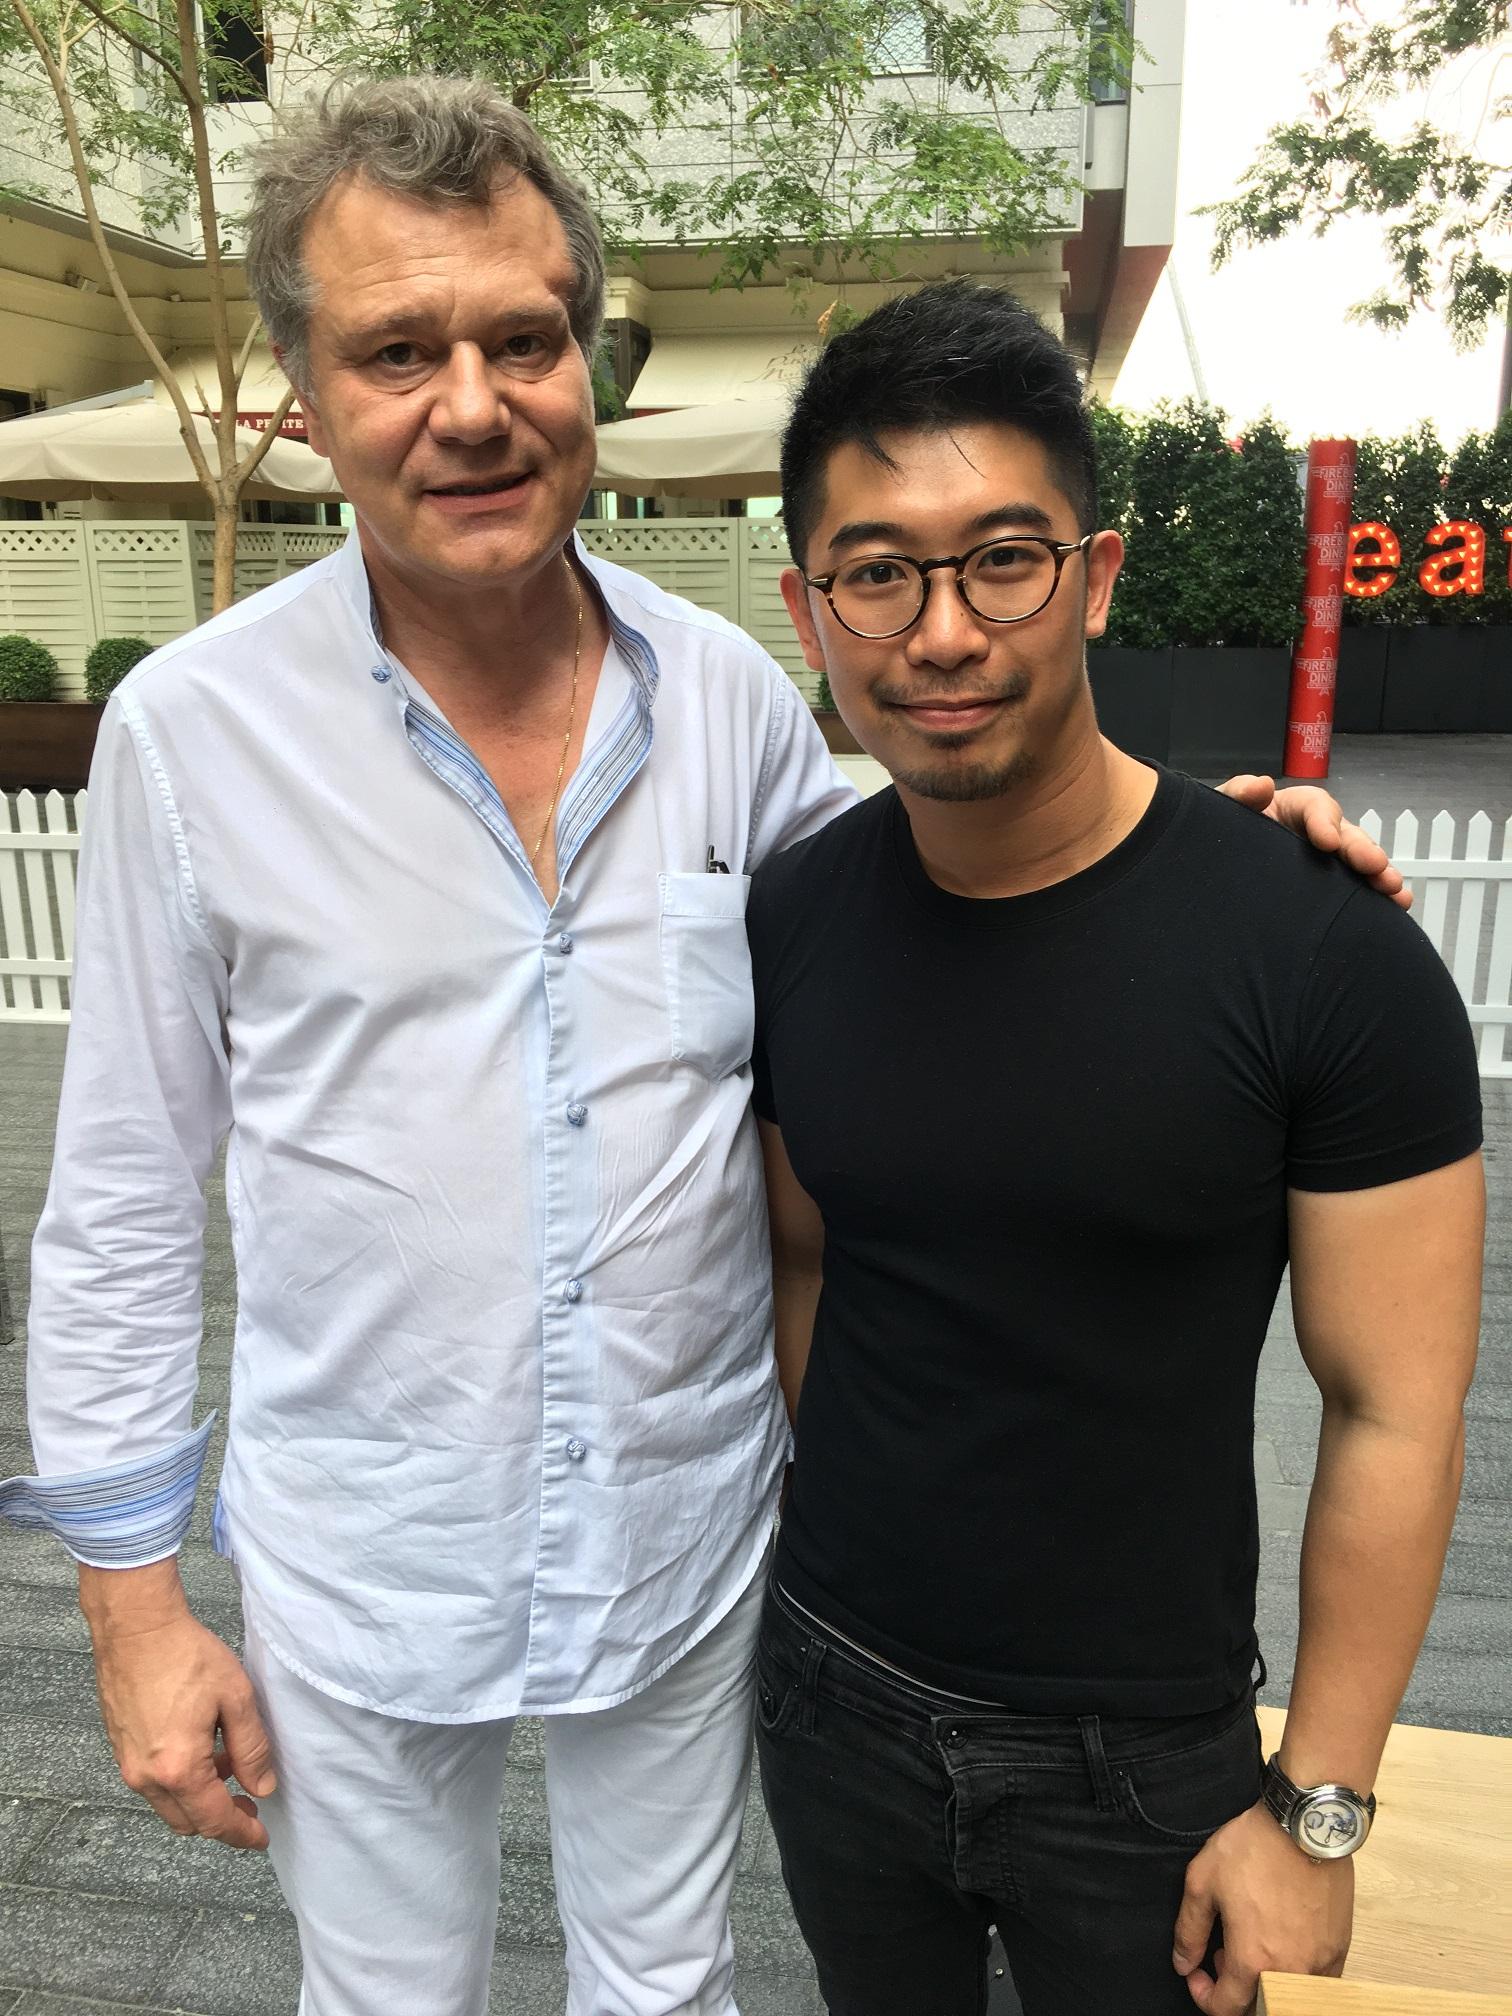 Mr. François-Paul Journe and I.